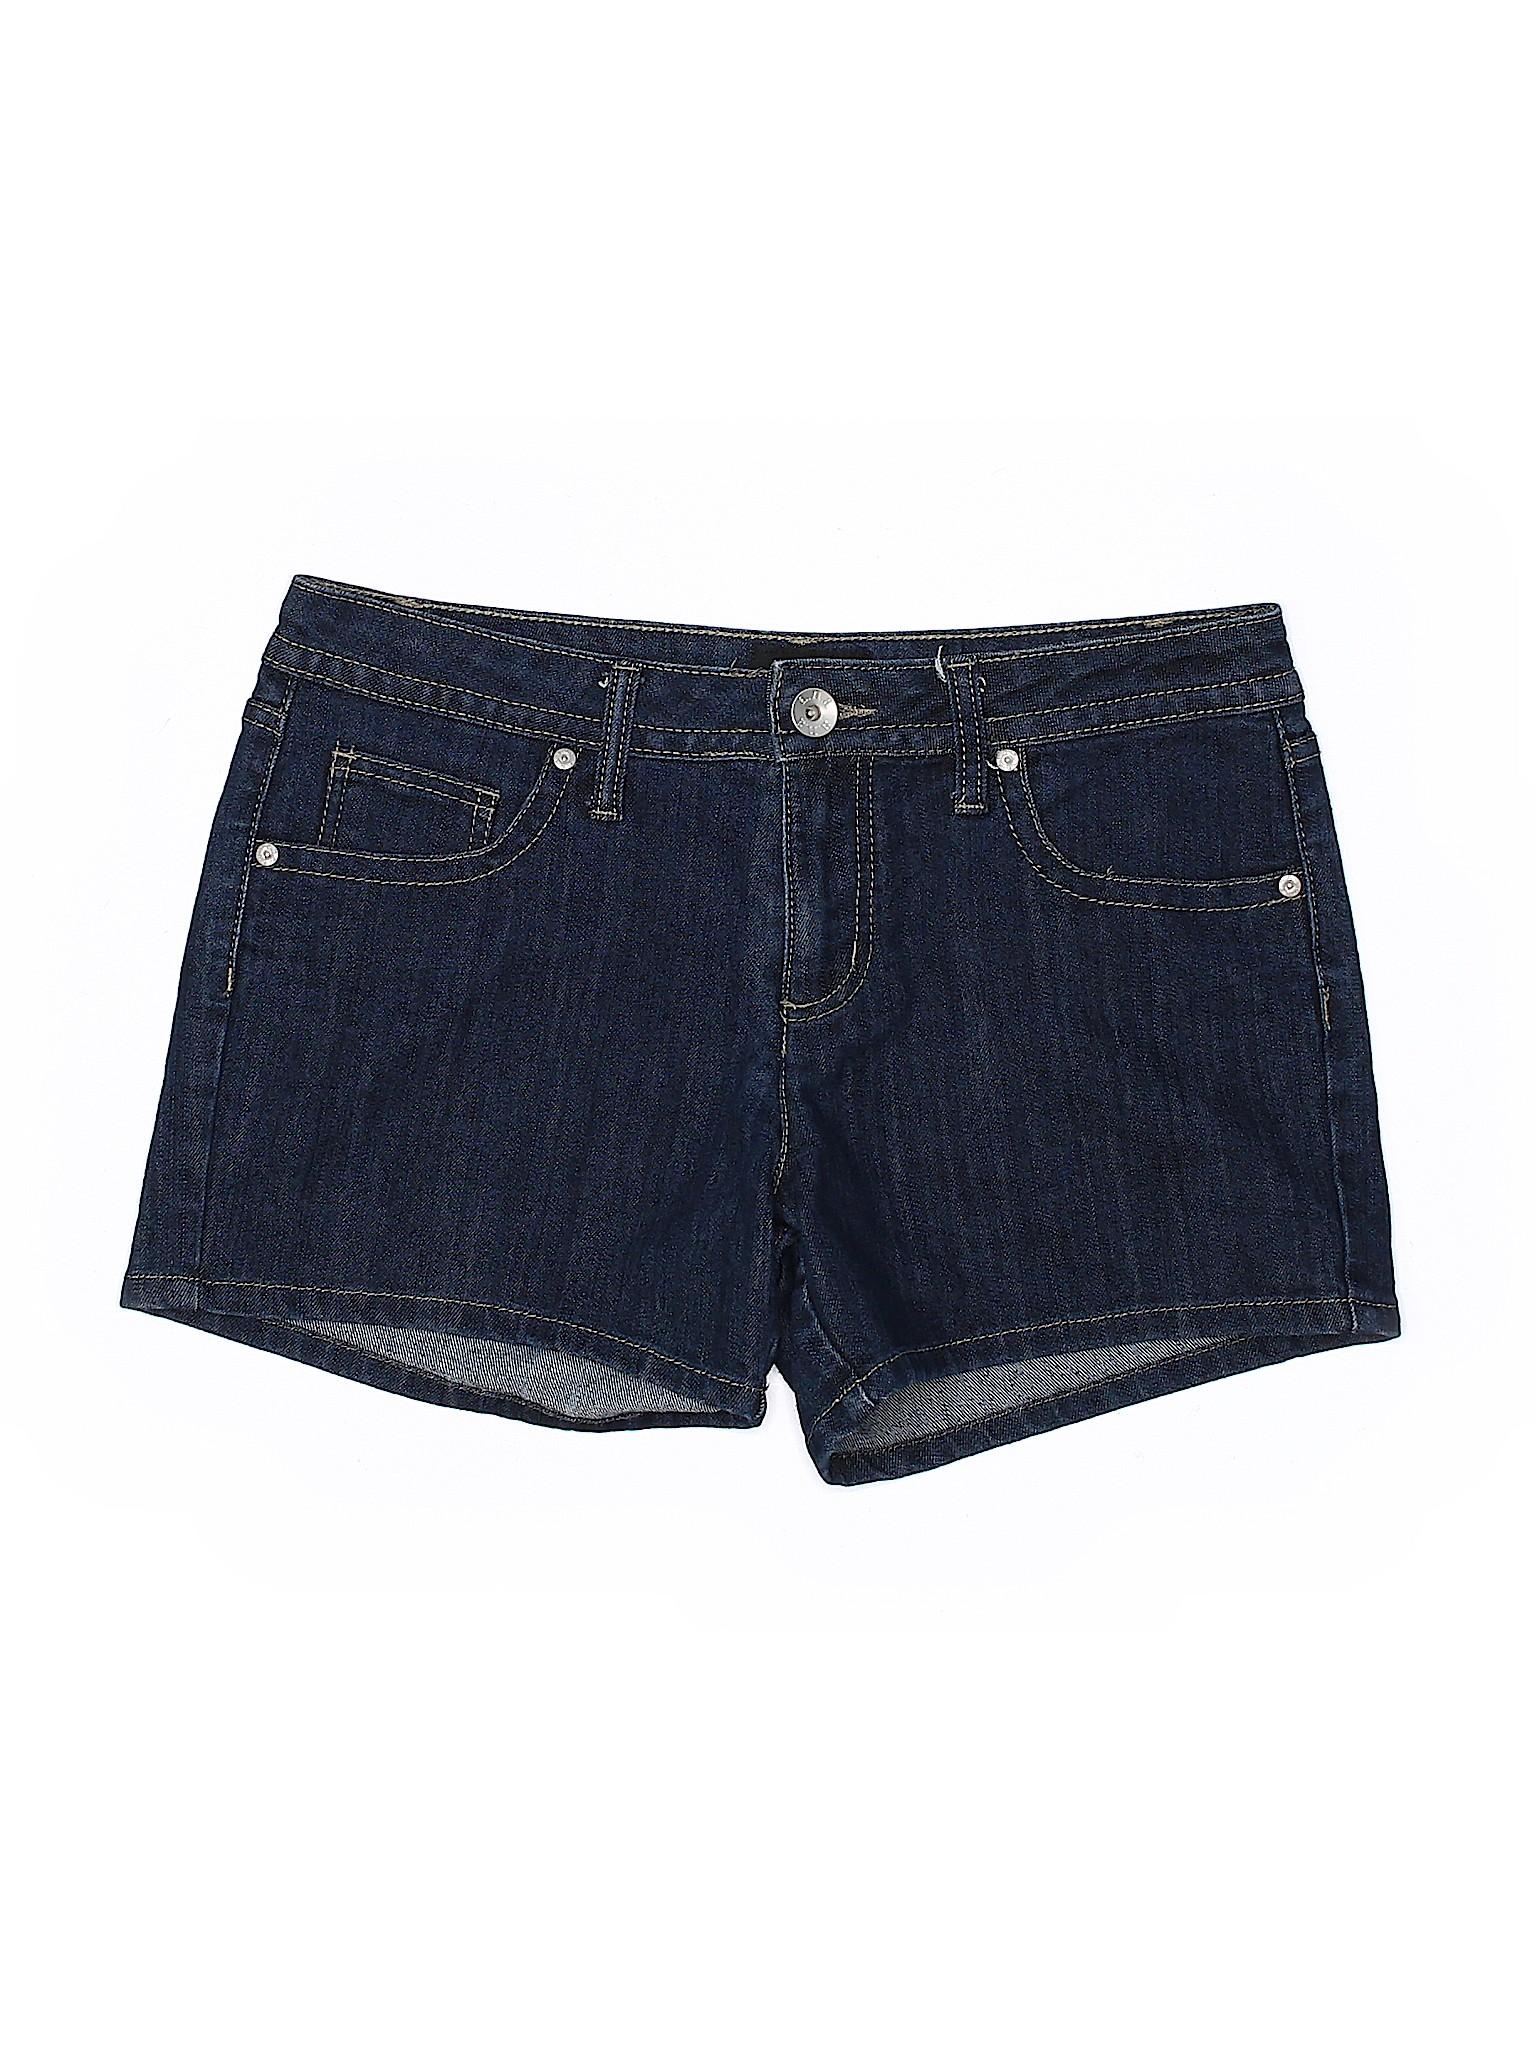 n Approach Boutique leisure Denim a A New Shorts a wRCFxABCEq